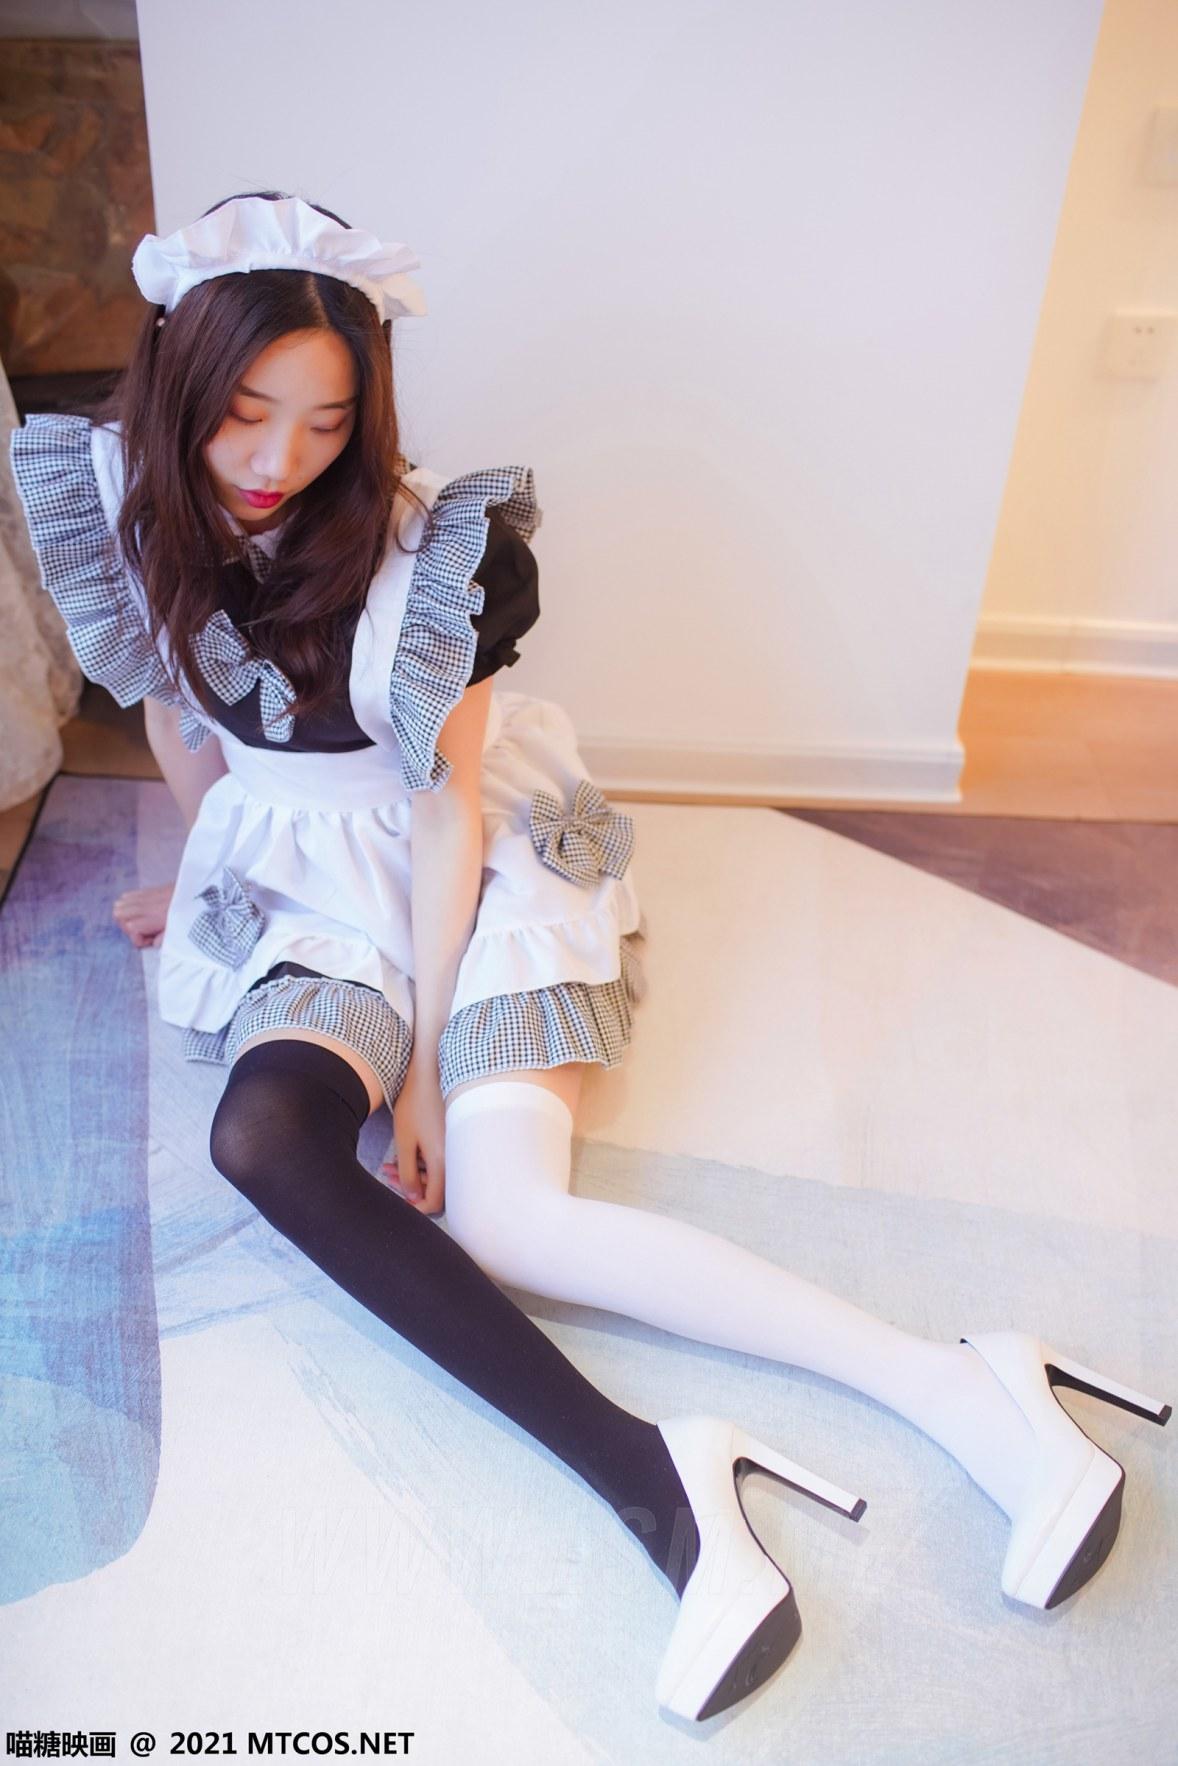 MTYH 喵糖映画 Vol.416 黑白女仆 - 1